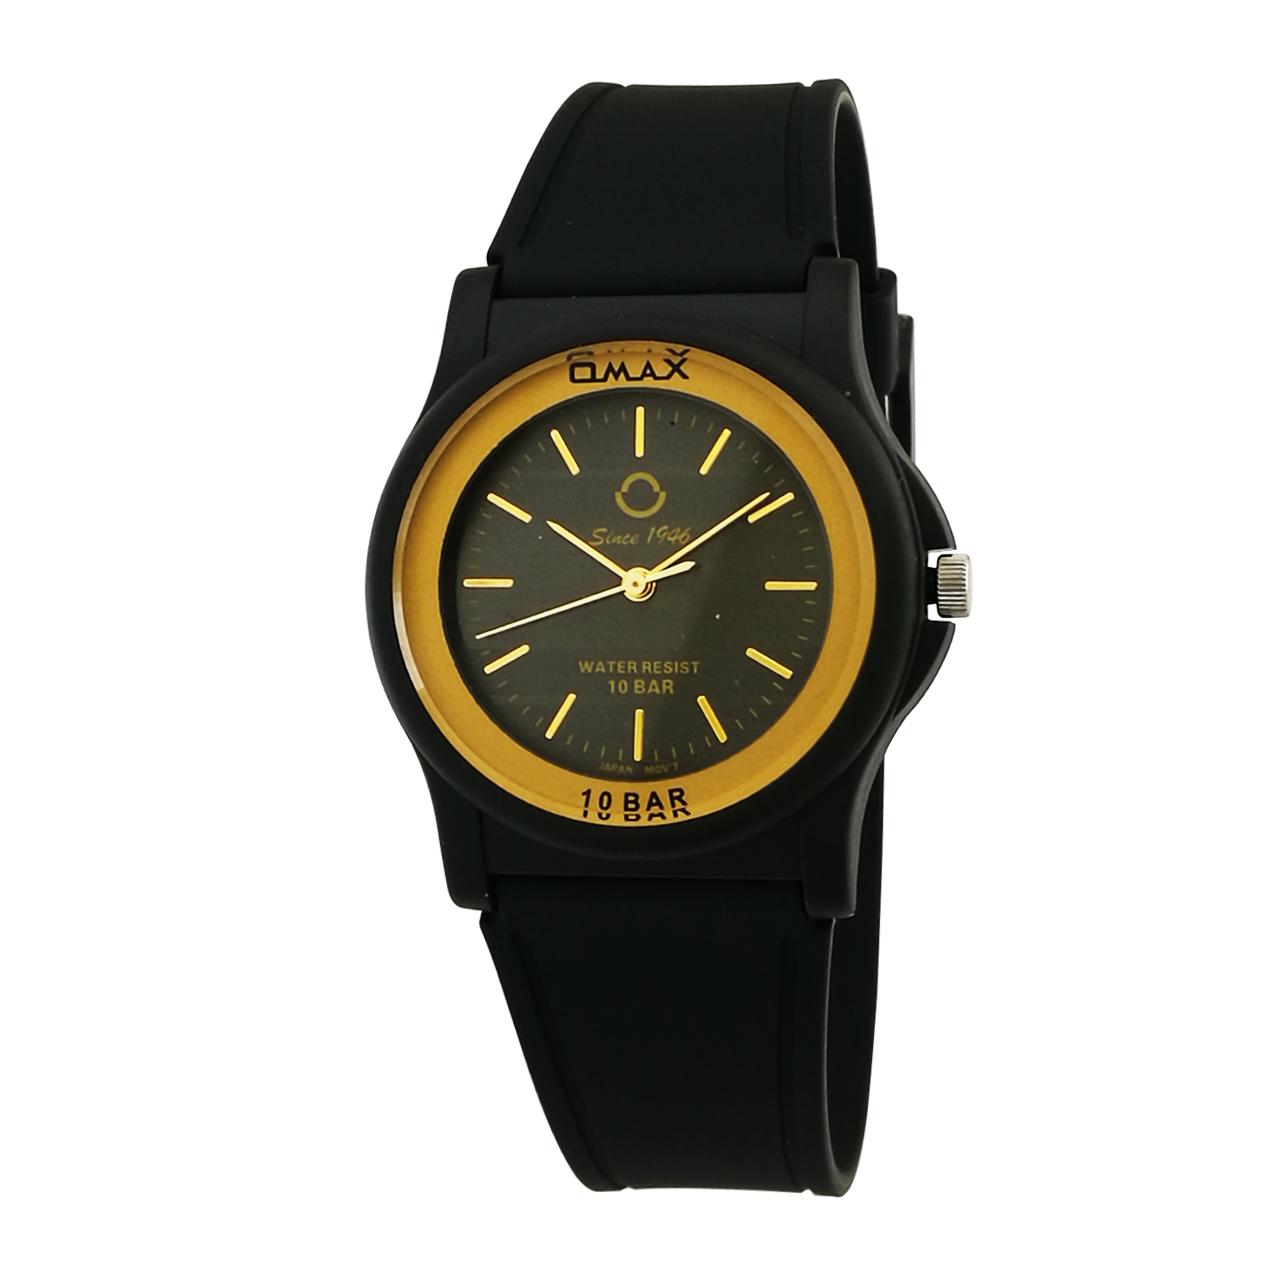 ساعت مچی عقربه ای پسرانه اوماکس مدل 00qp03